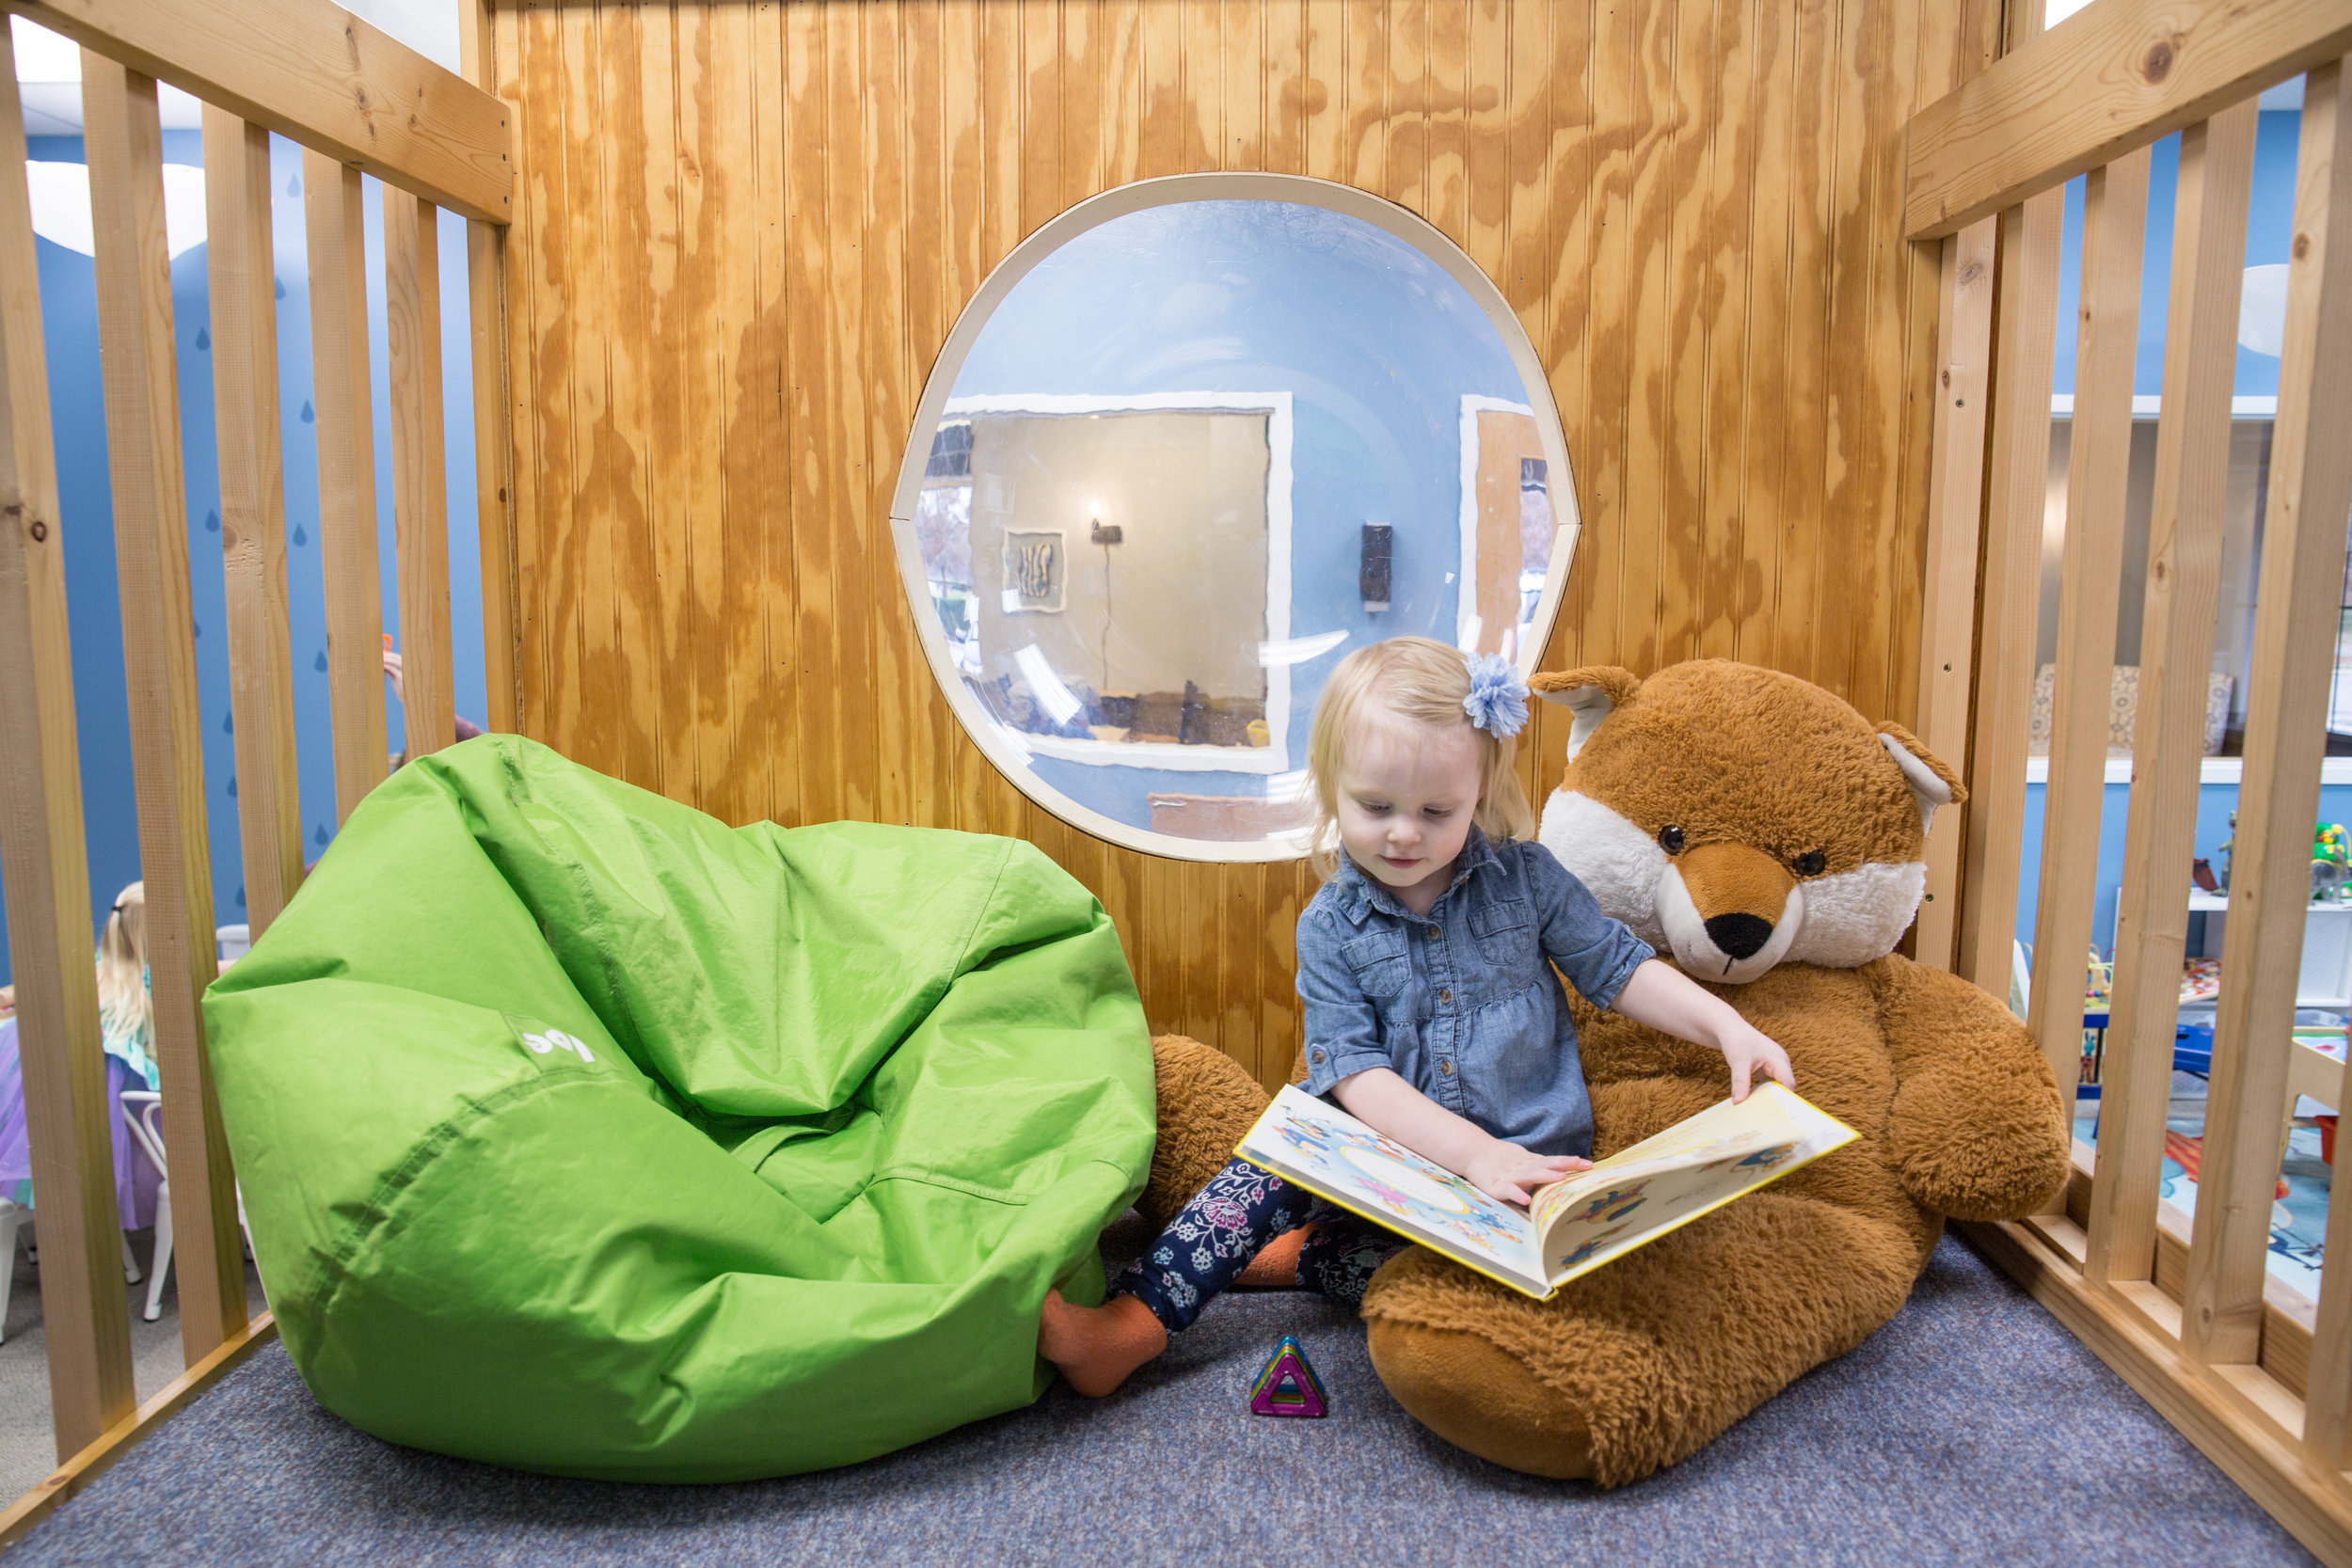 Hoot_Studio_Play_Cafe_Kid_Reading.jpg